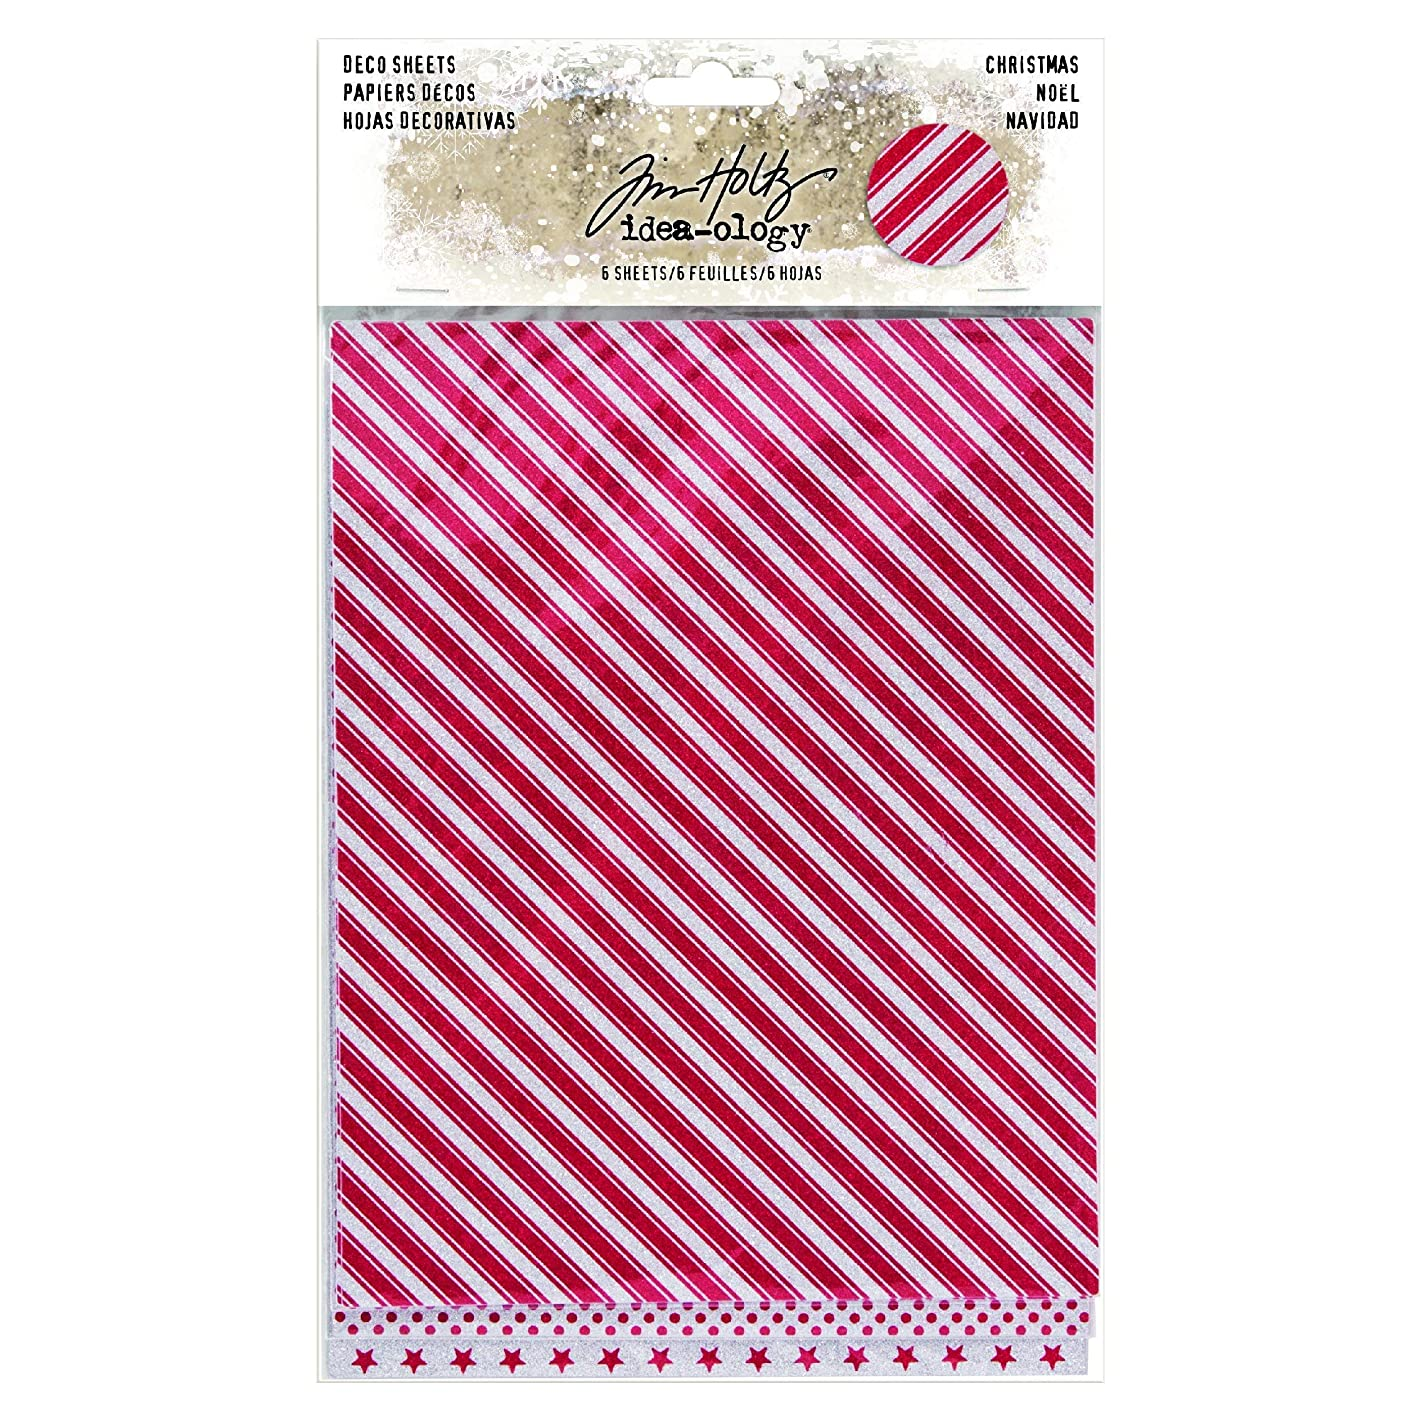 ADVANTUS CORPORATION Idea-Ology Adhesive Deco Sheets 7